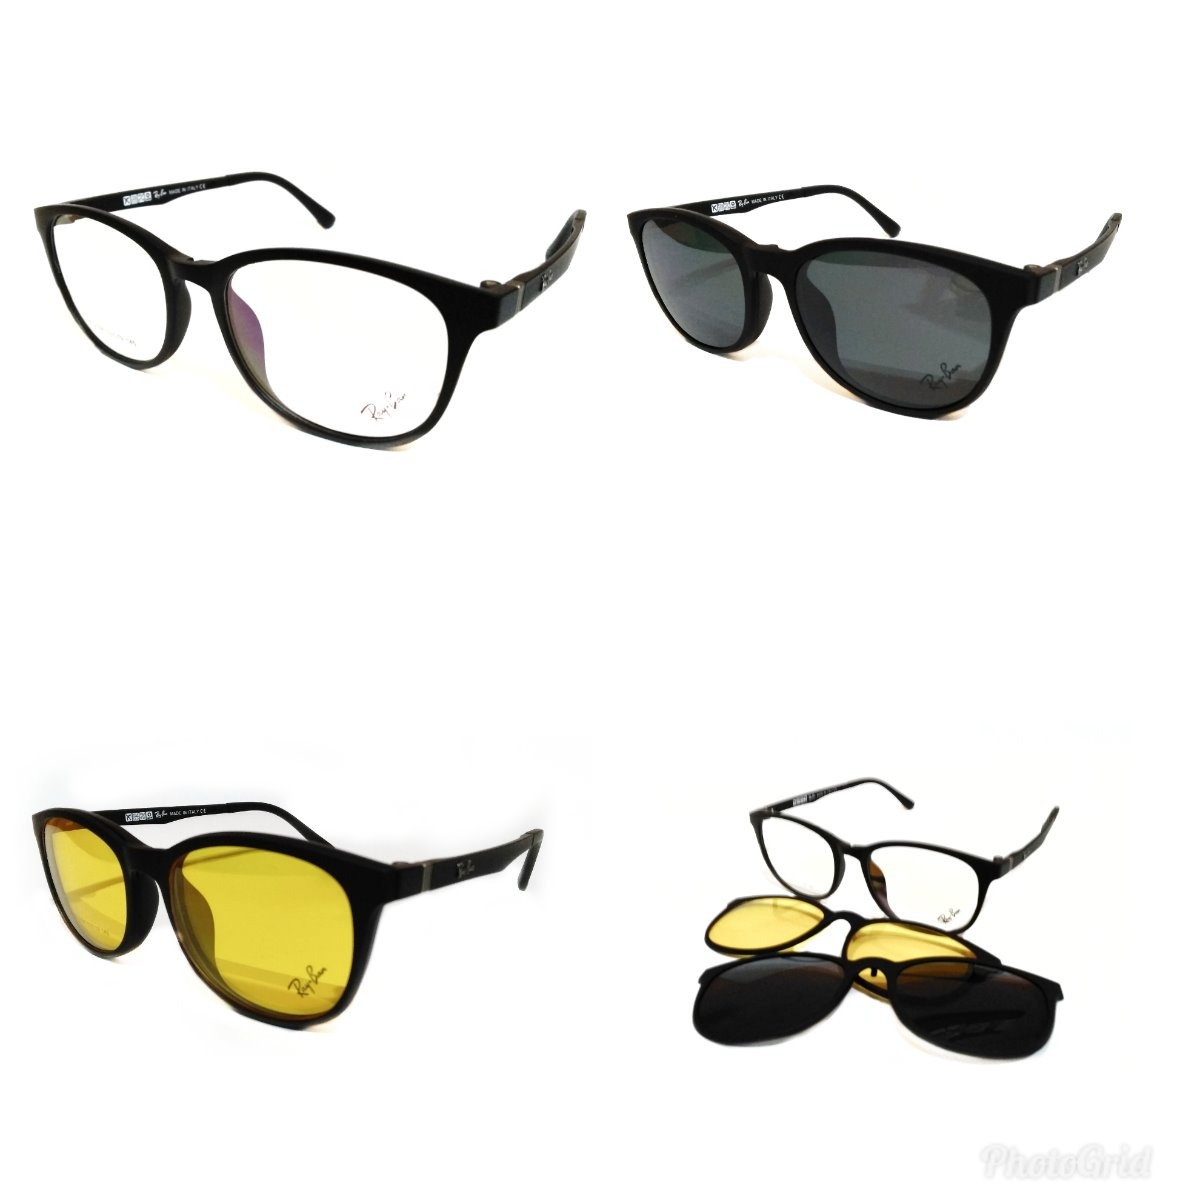 6f0261294 r2096 oculos grau sol ray-ban redondo 2clipon envio em 24h. Carregando zoom.